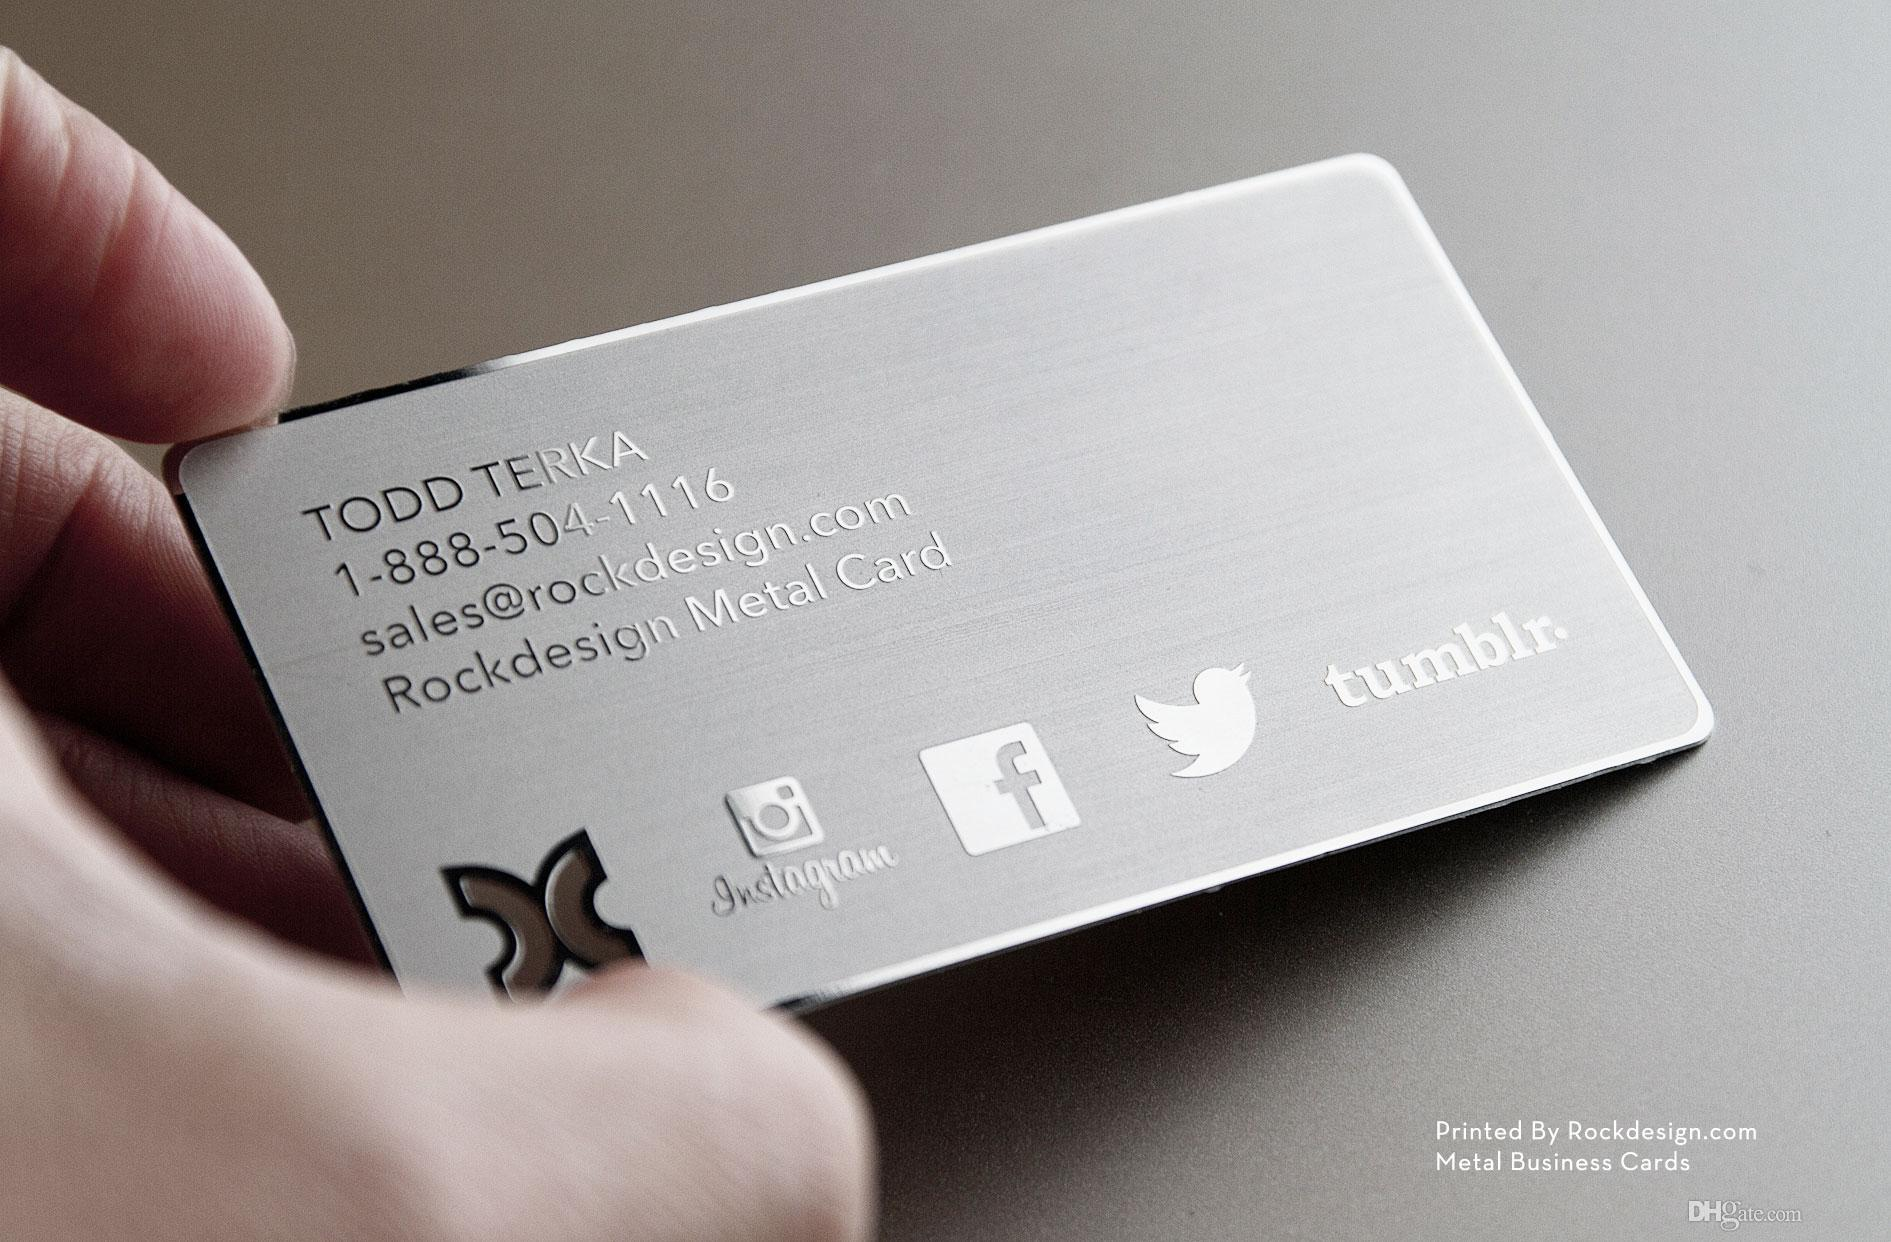 Top grade metal business card stainless steel business for Business cards metal